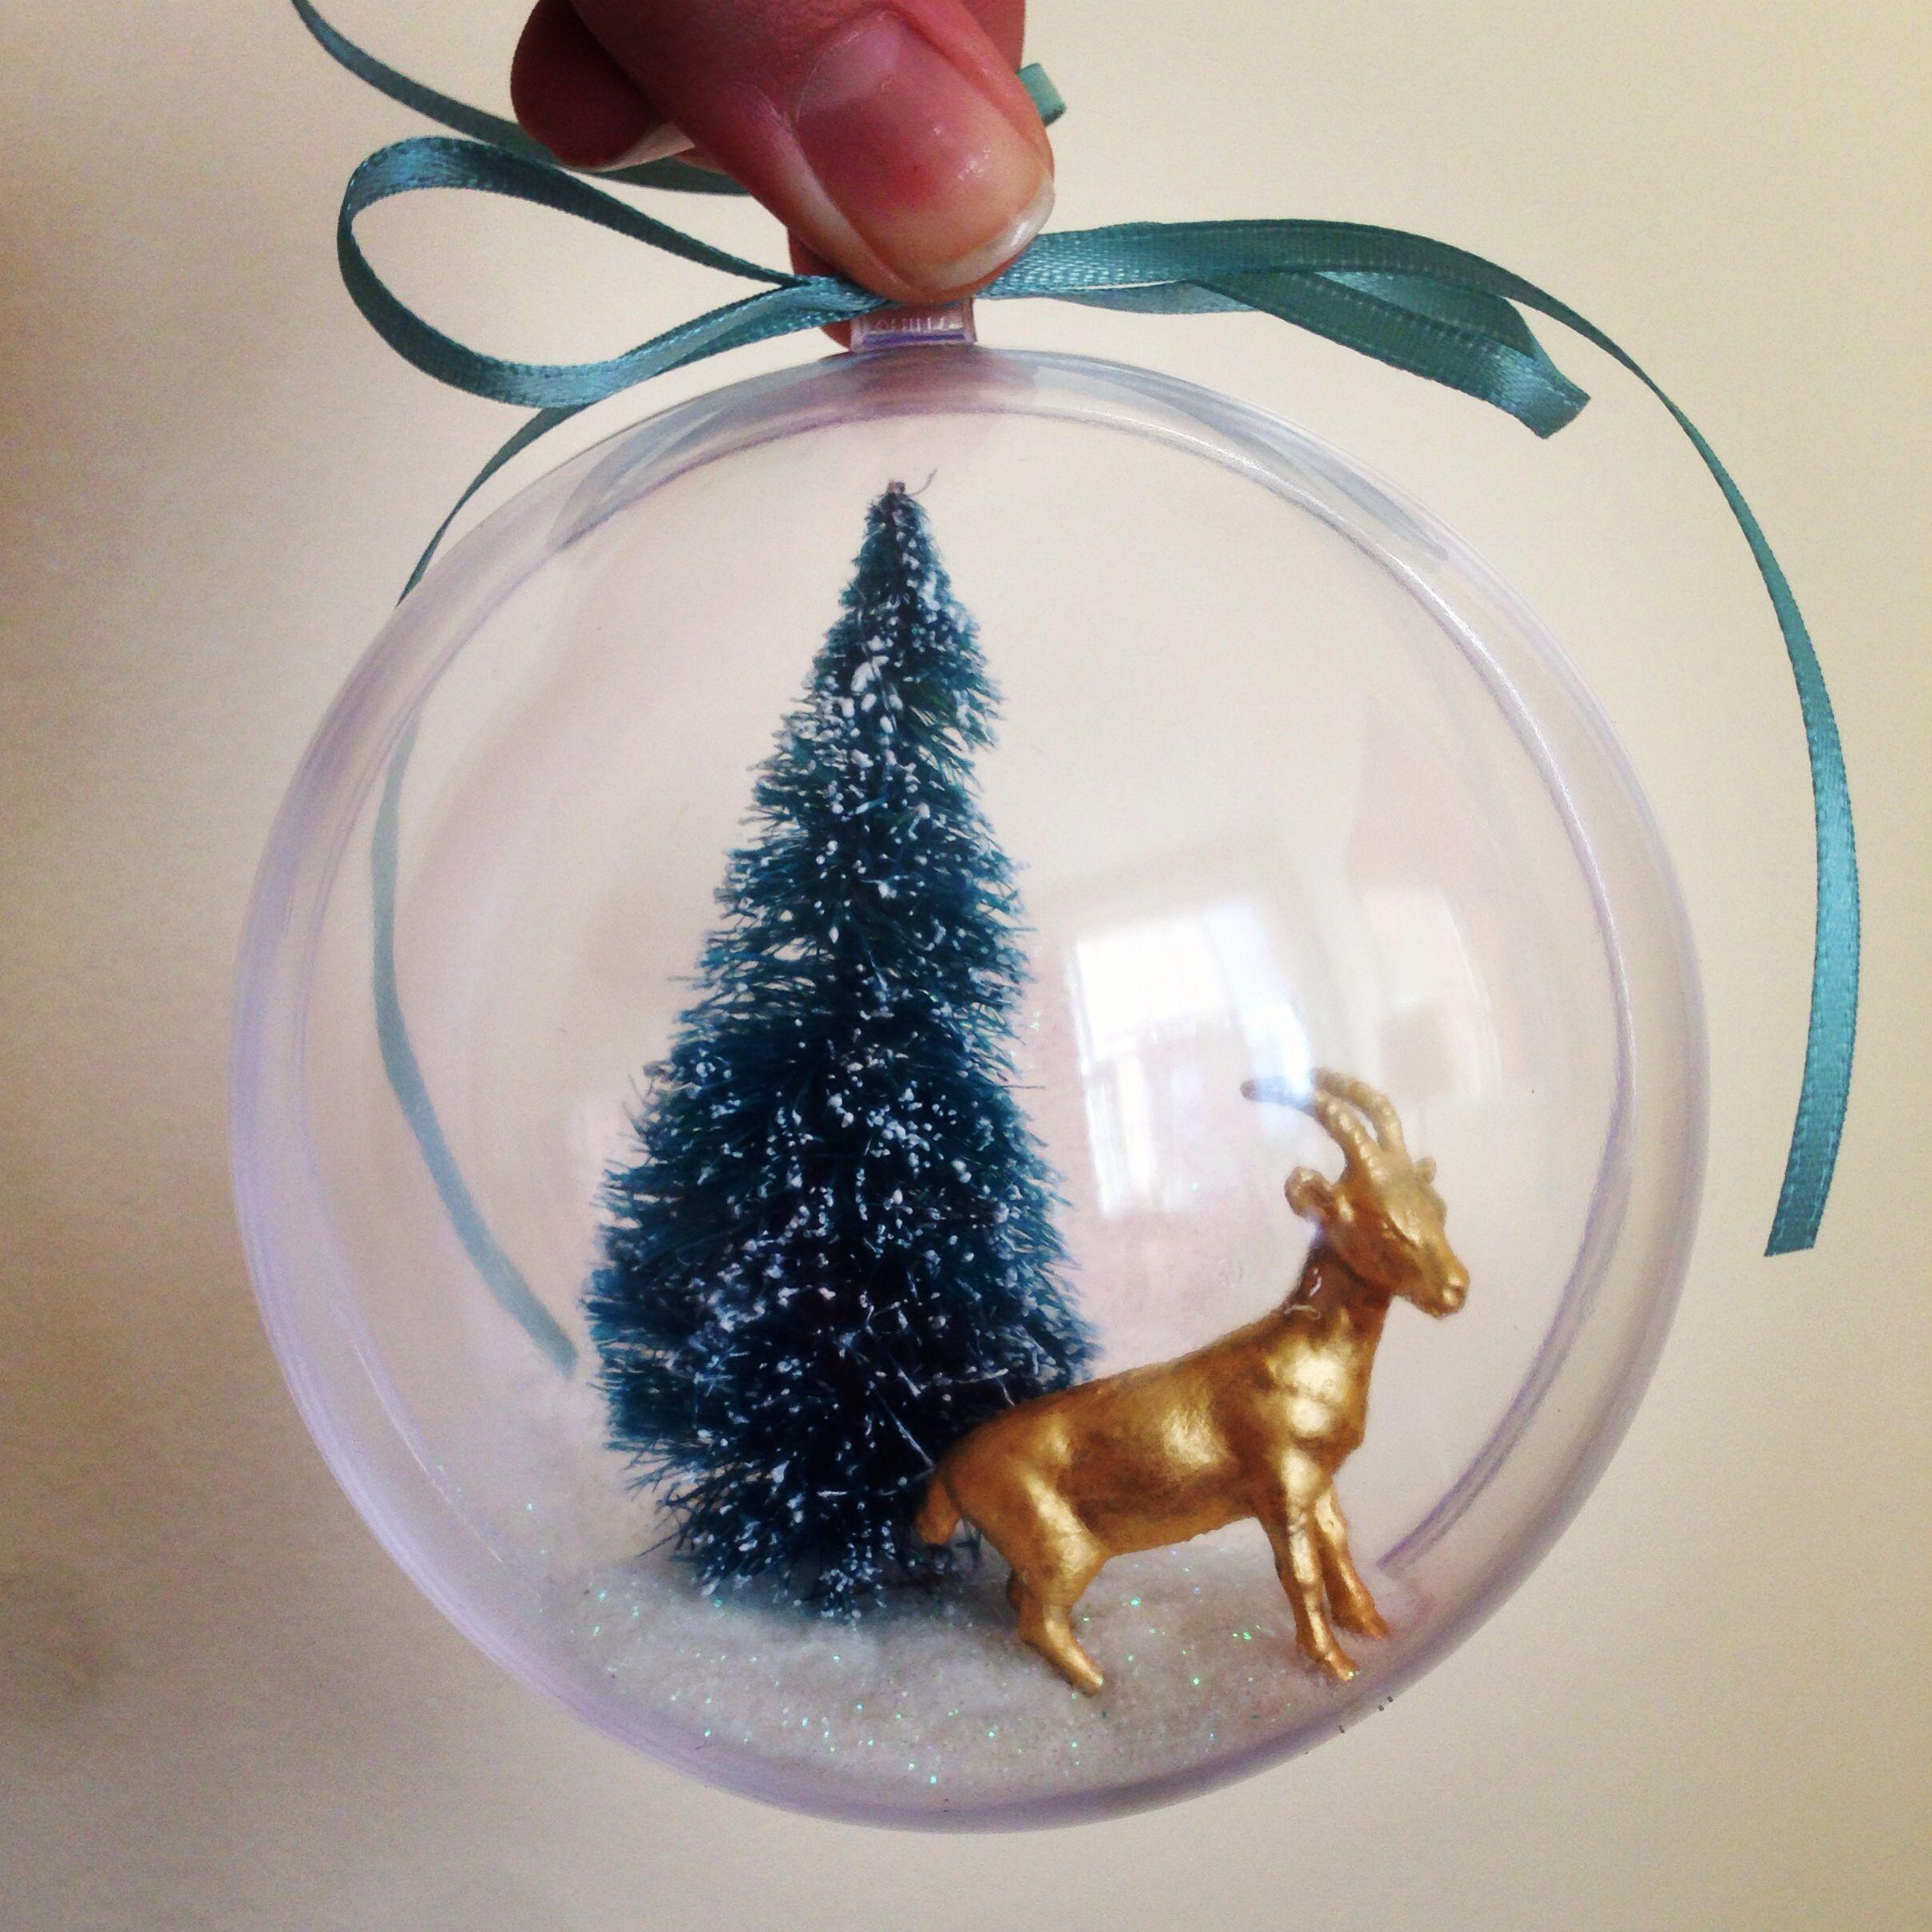 Goat Christmas Ornament.Diy Golden Goat Christmas Ornament Holiday Cheer